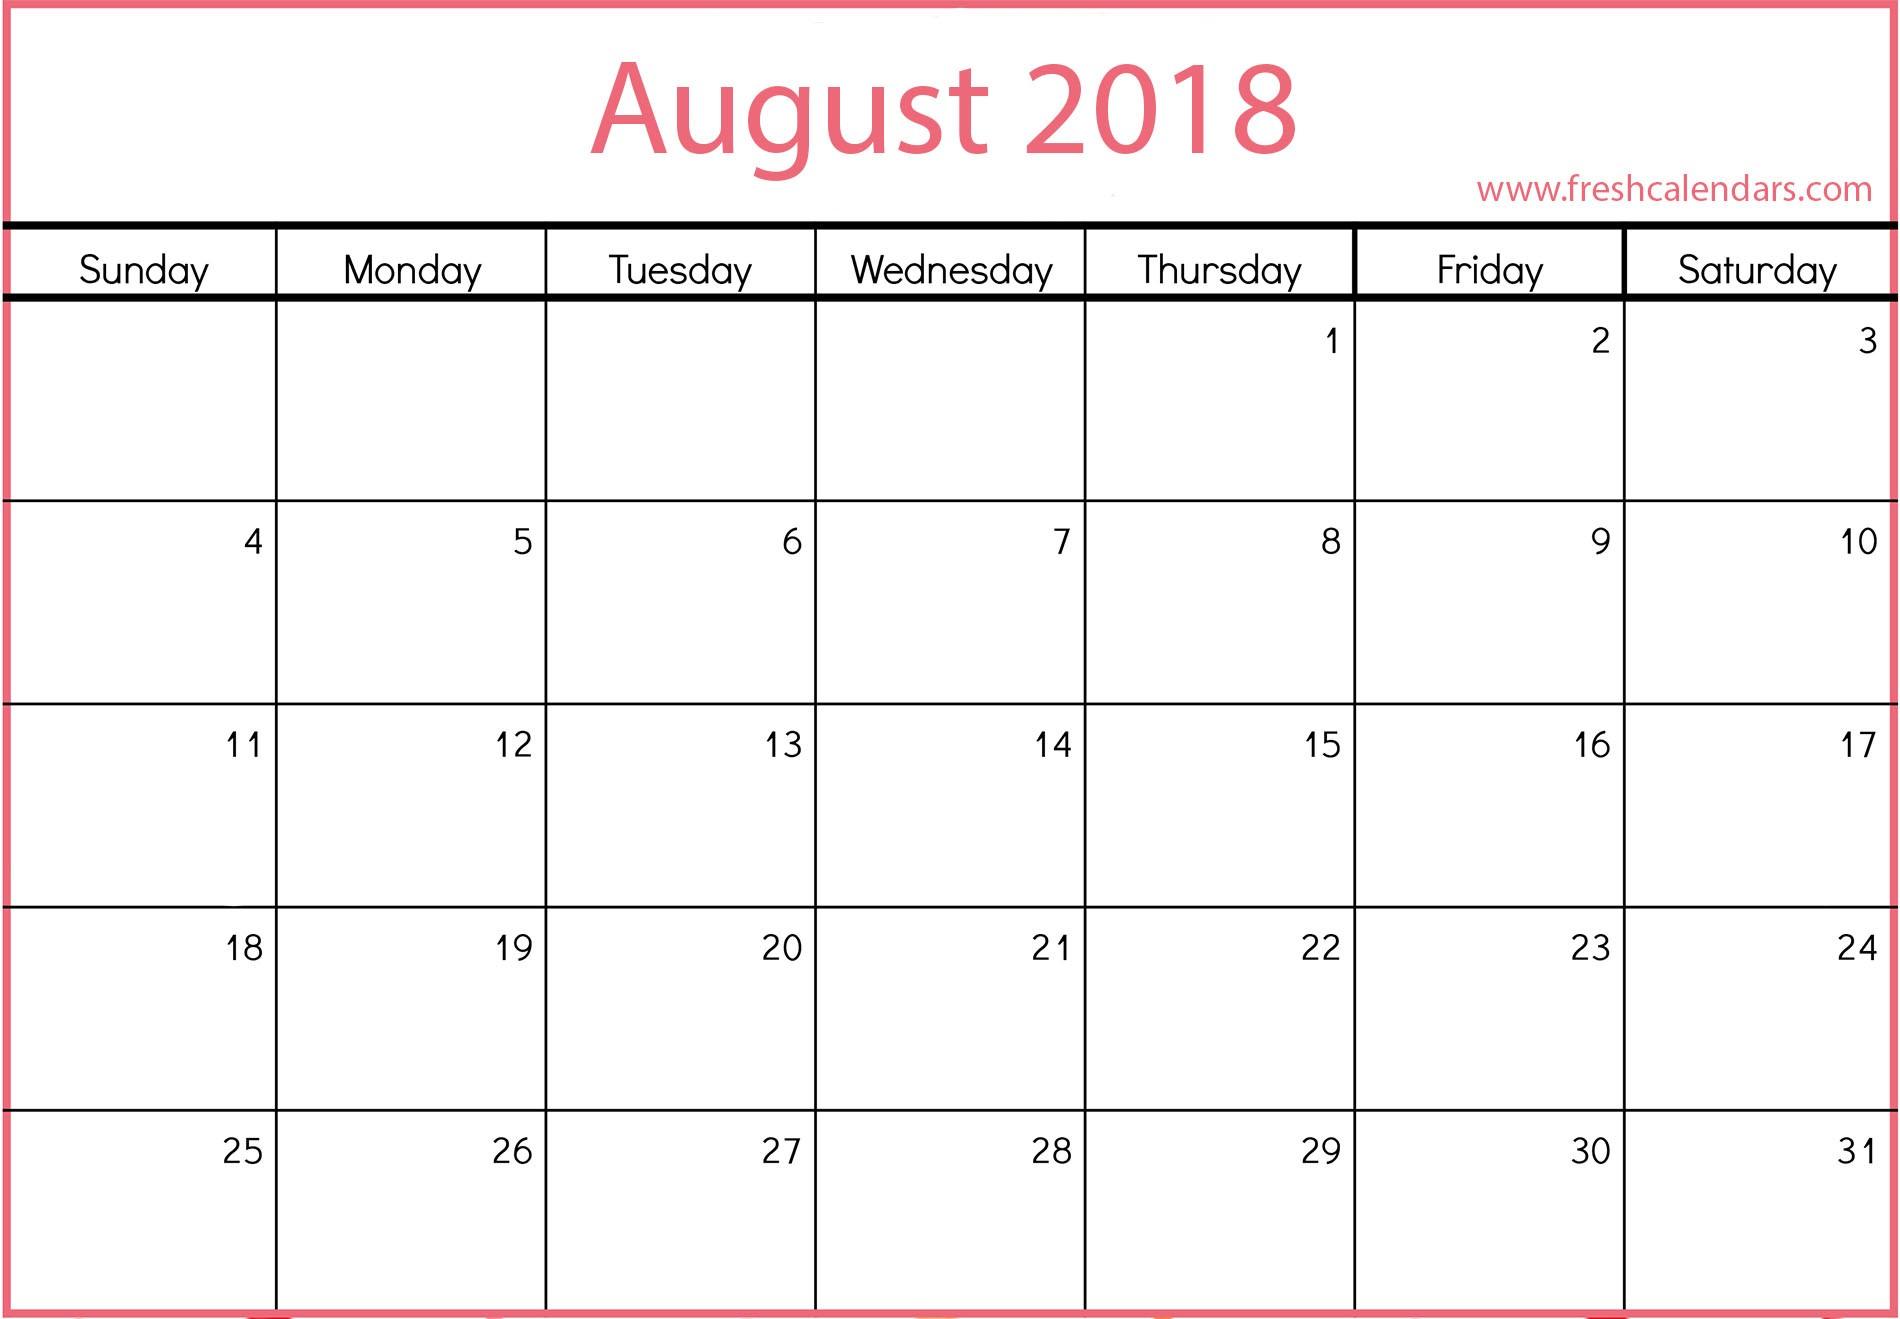 Calendars 2019 Printable Printable August 2019 Calendar Fresh Calendars